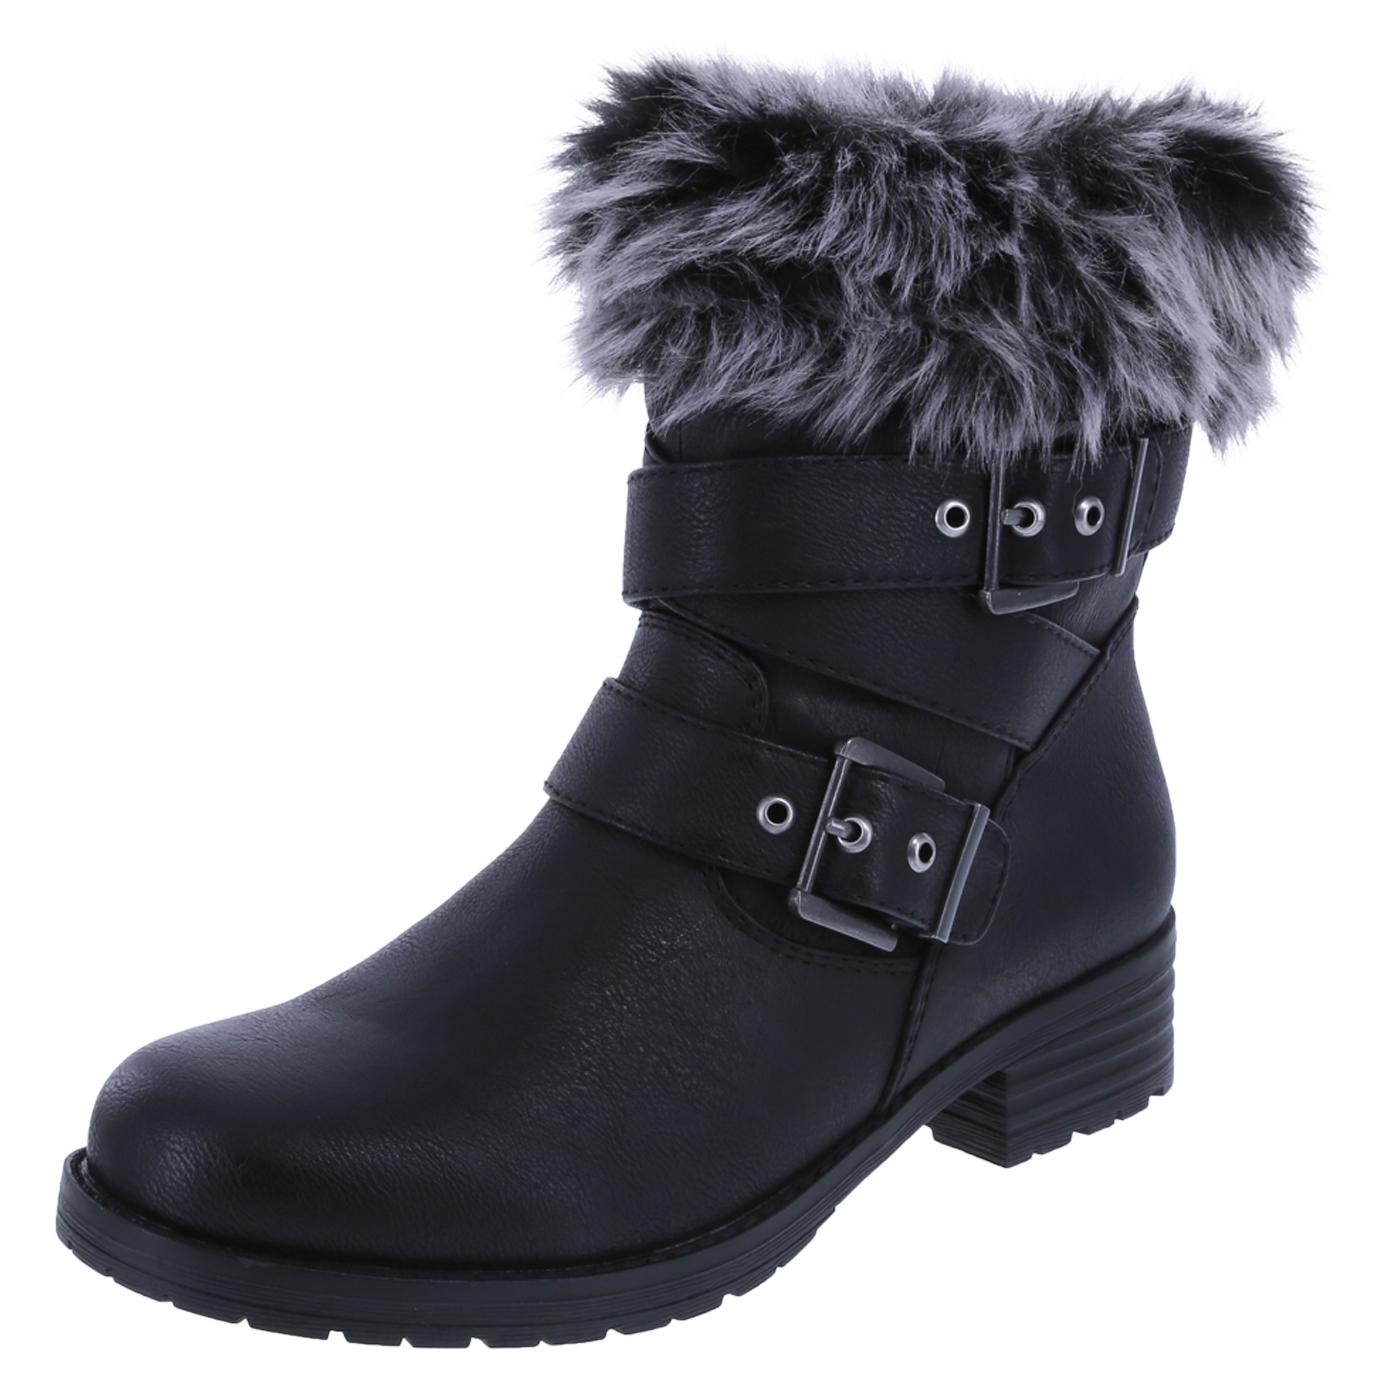 women boots womenu0027s talley fold-over cozy bootwomenu0027s talley fold-over cozy boot, black WOBXOUI